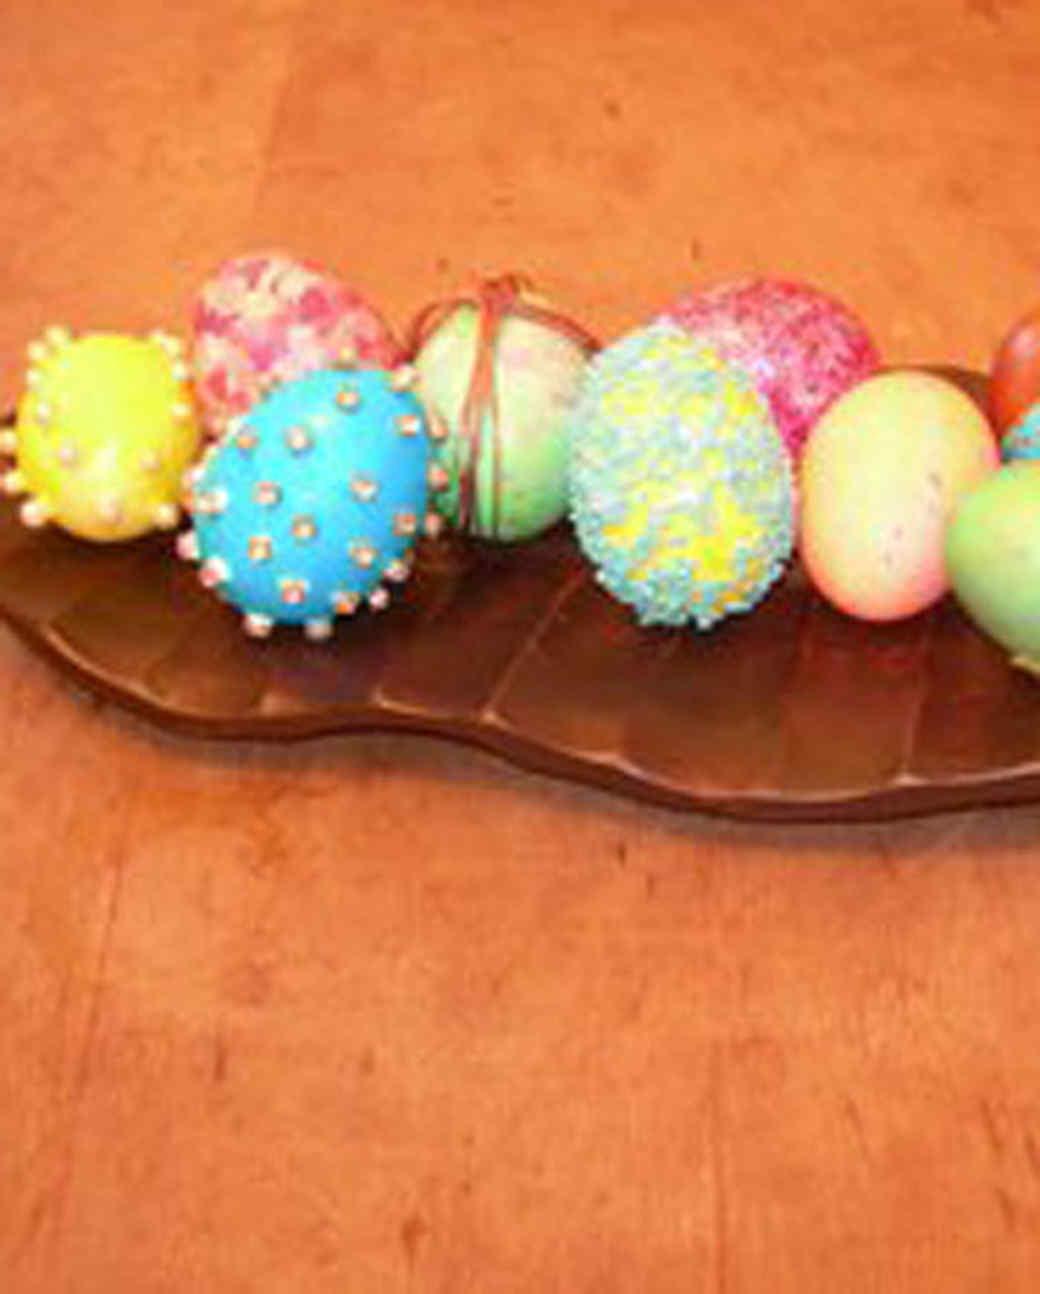 ew_march08_easter_eggs_9.jpg